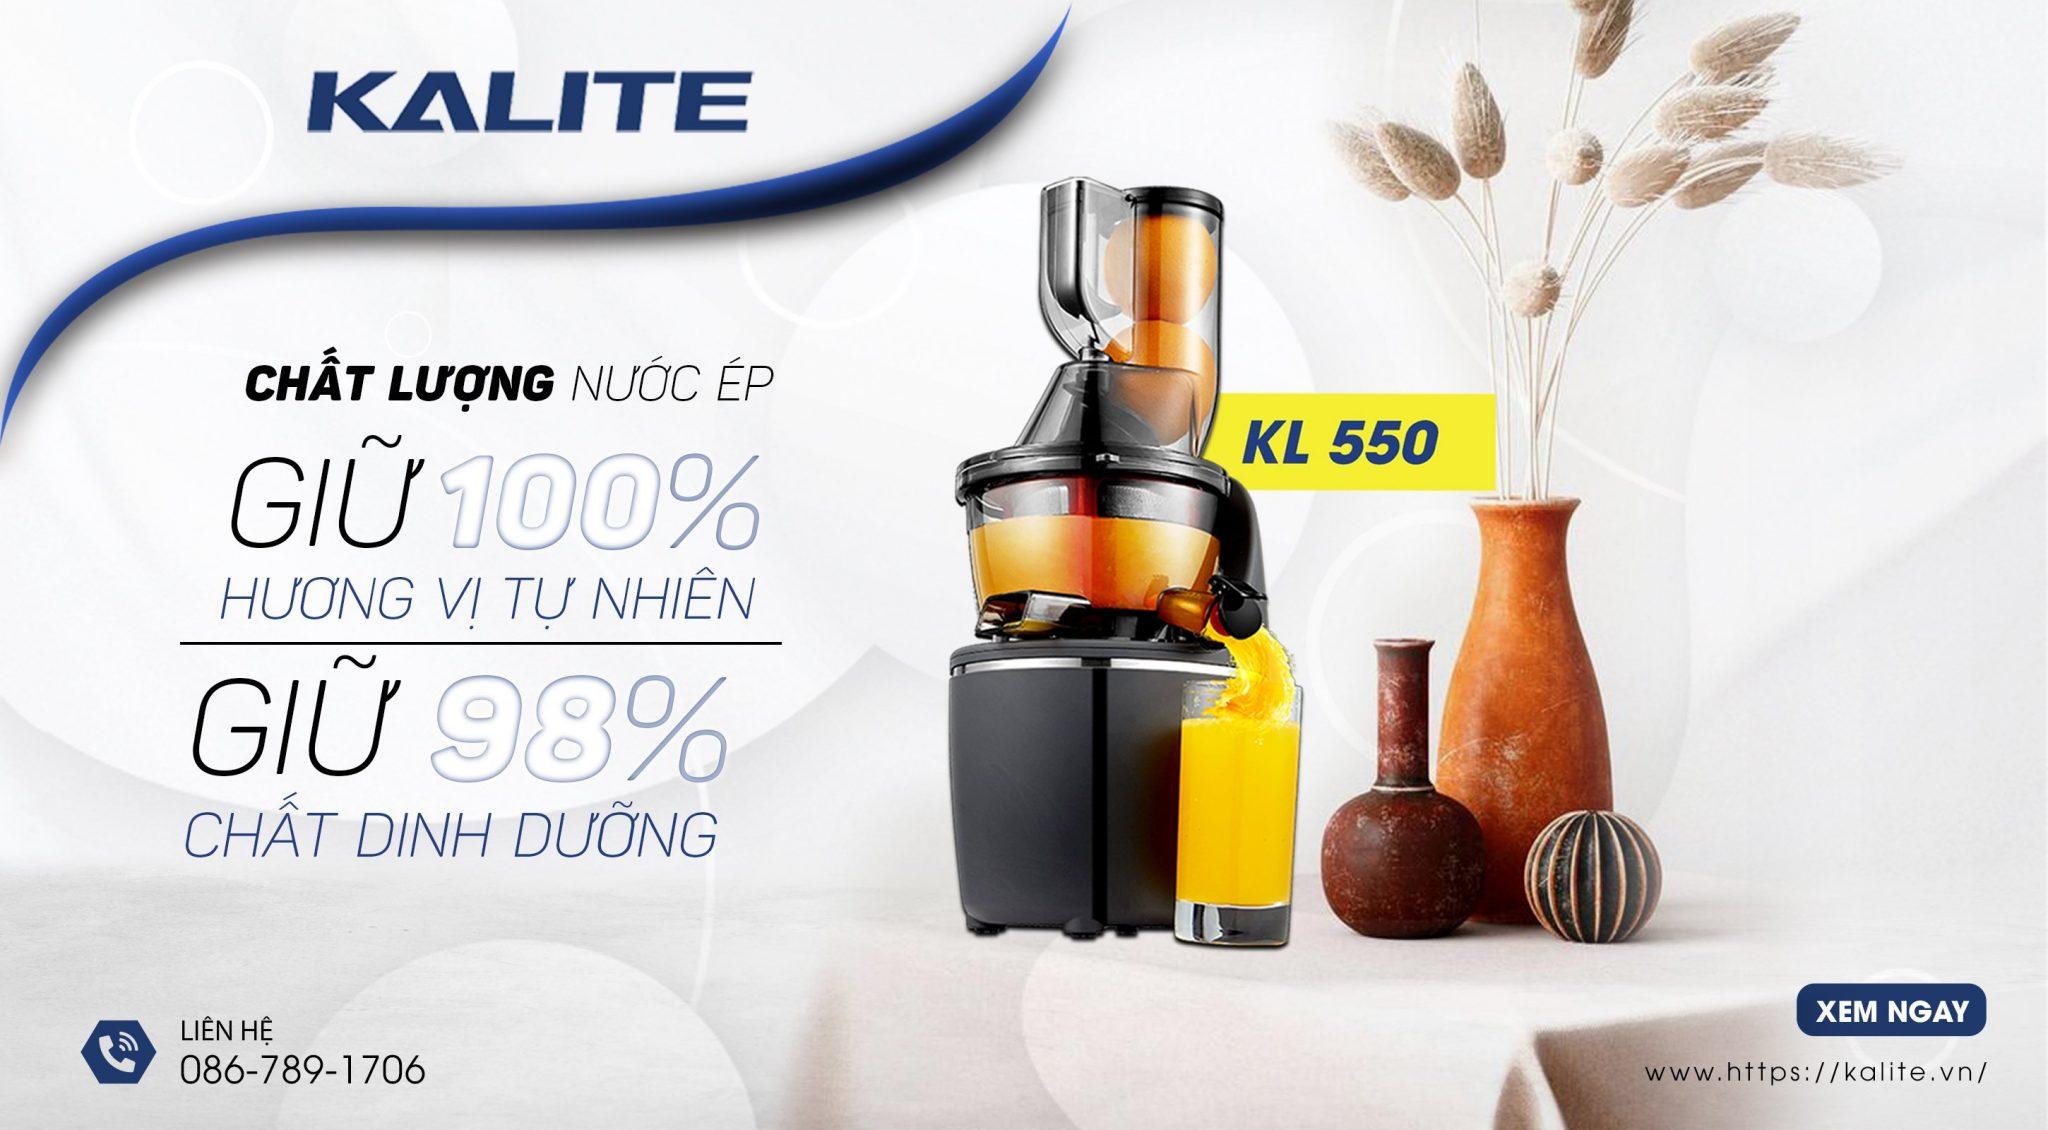 Máy ép chậm Kalite KL-550